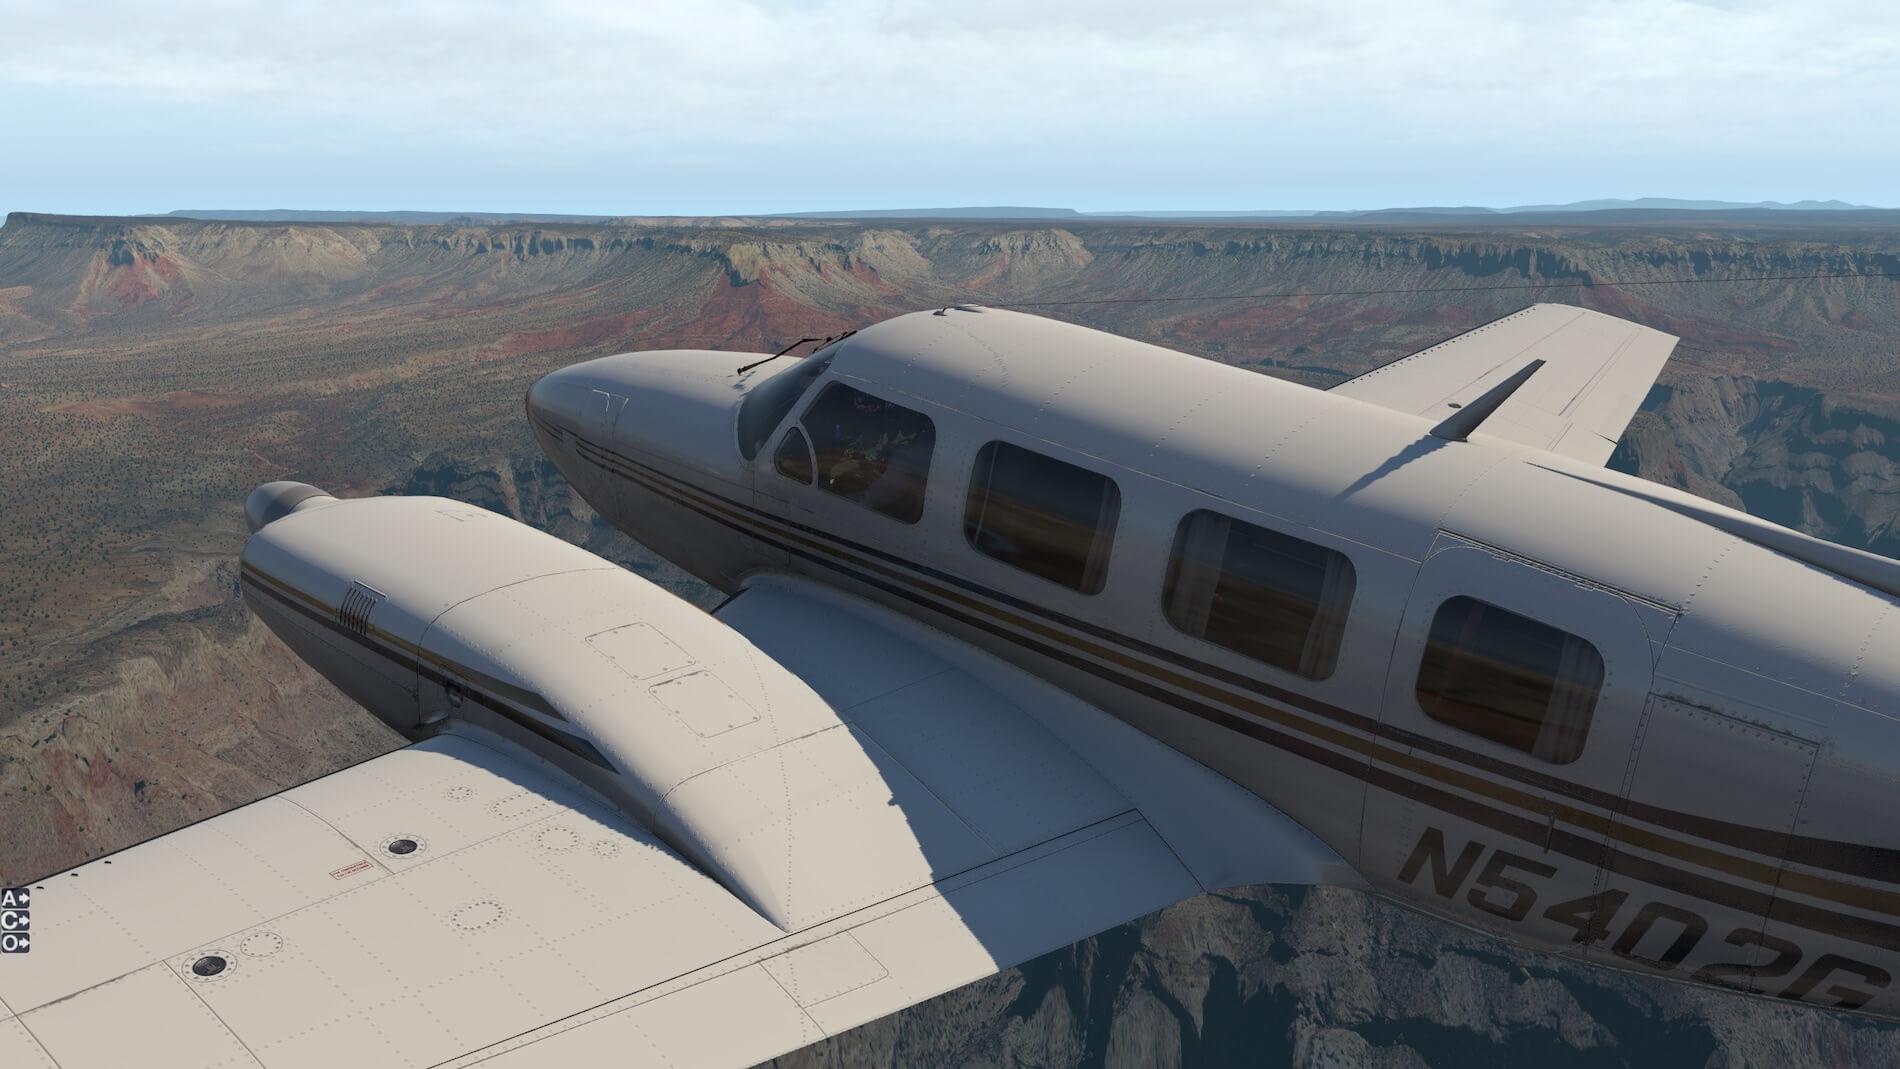 Carenado-PA31-Grand-Canyon-Tour-15